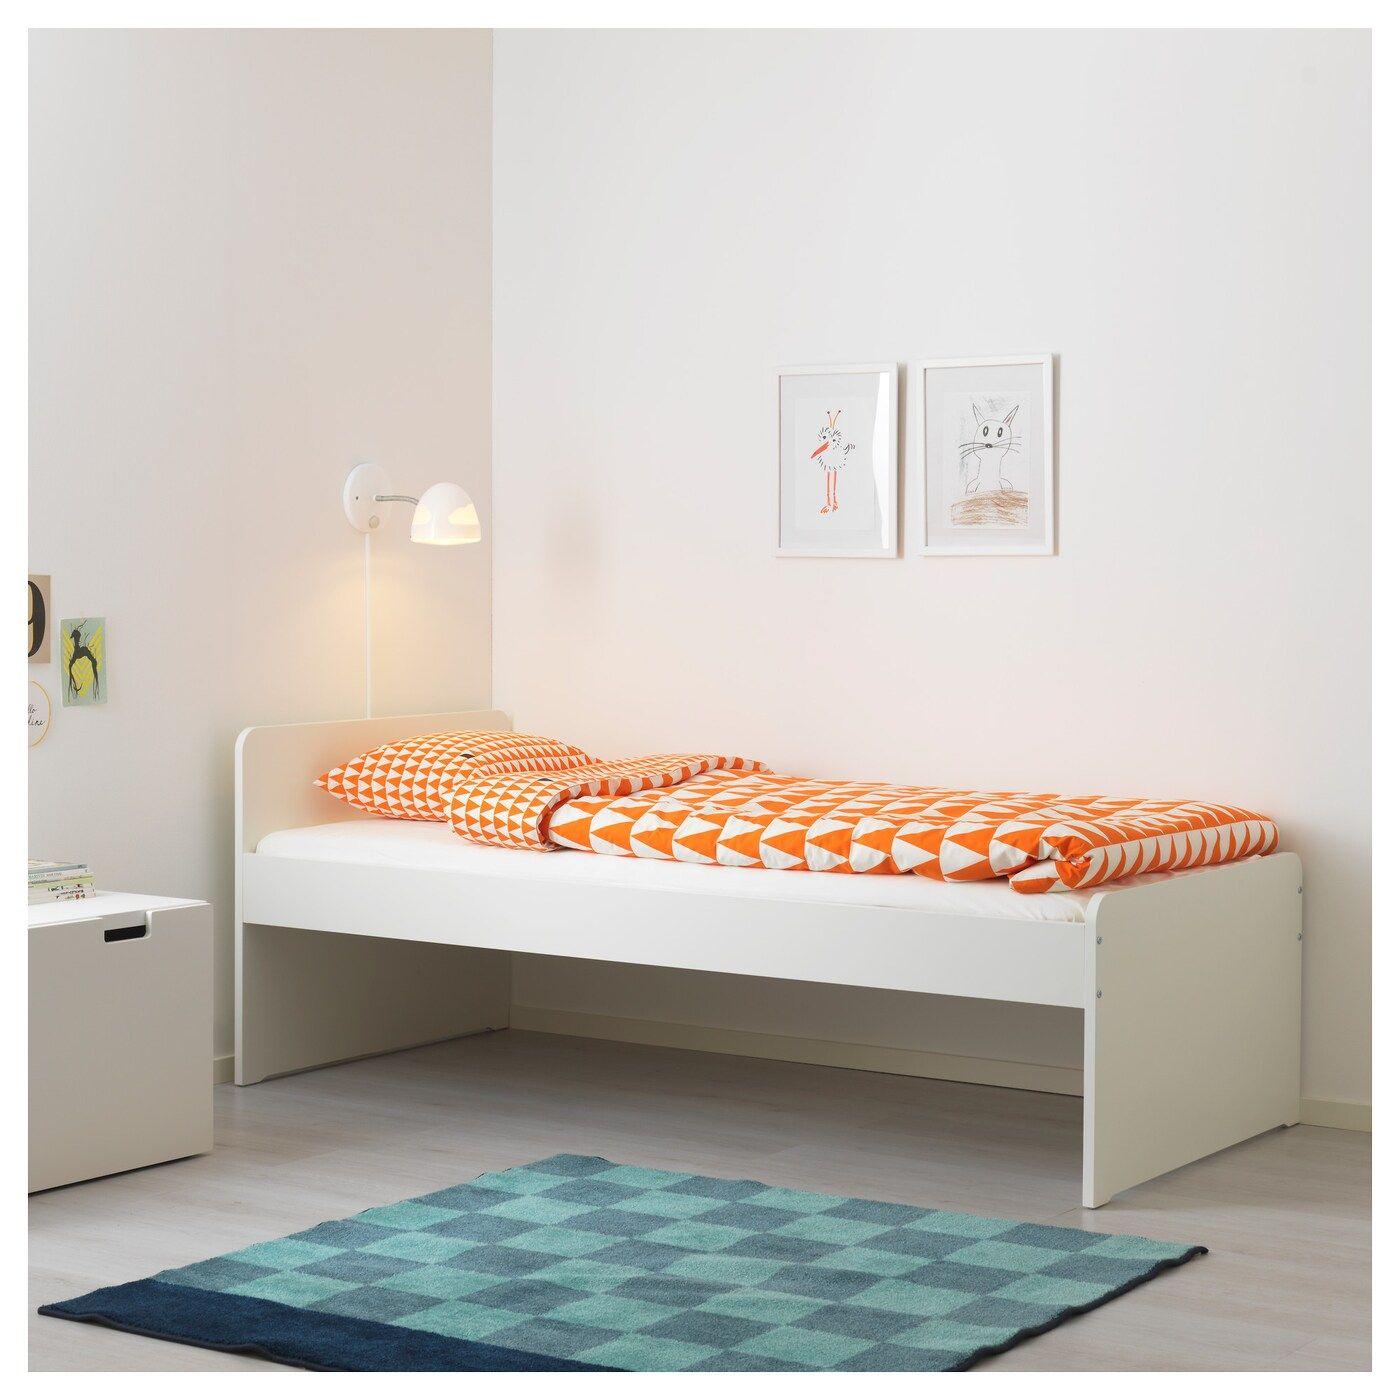 IKEA SLÄKT Bed frame with slatted bed base white Ikea